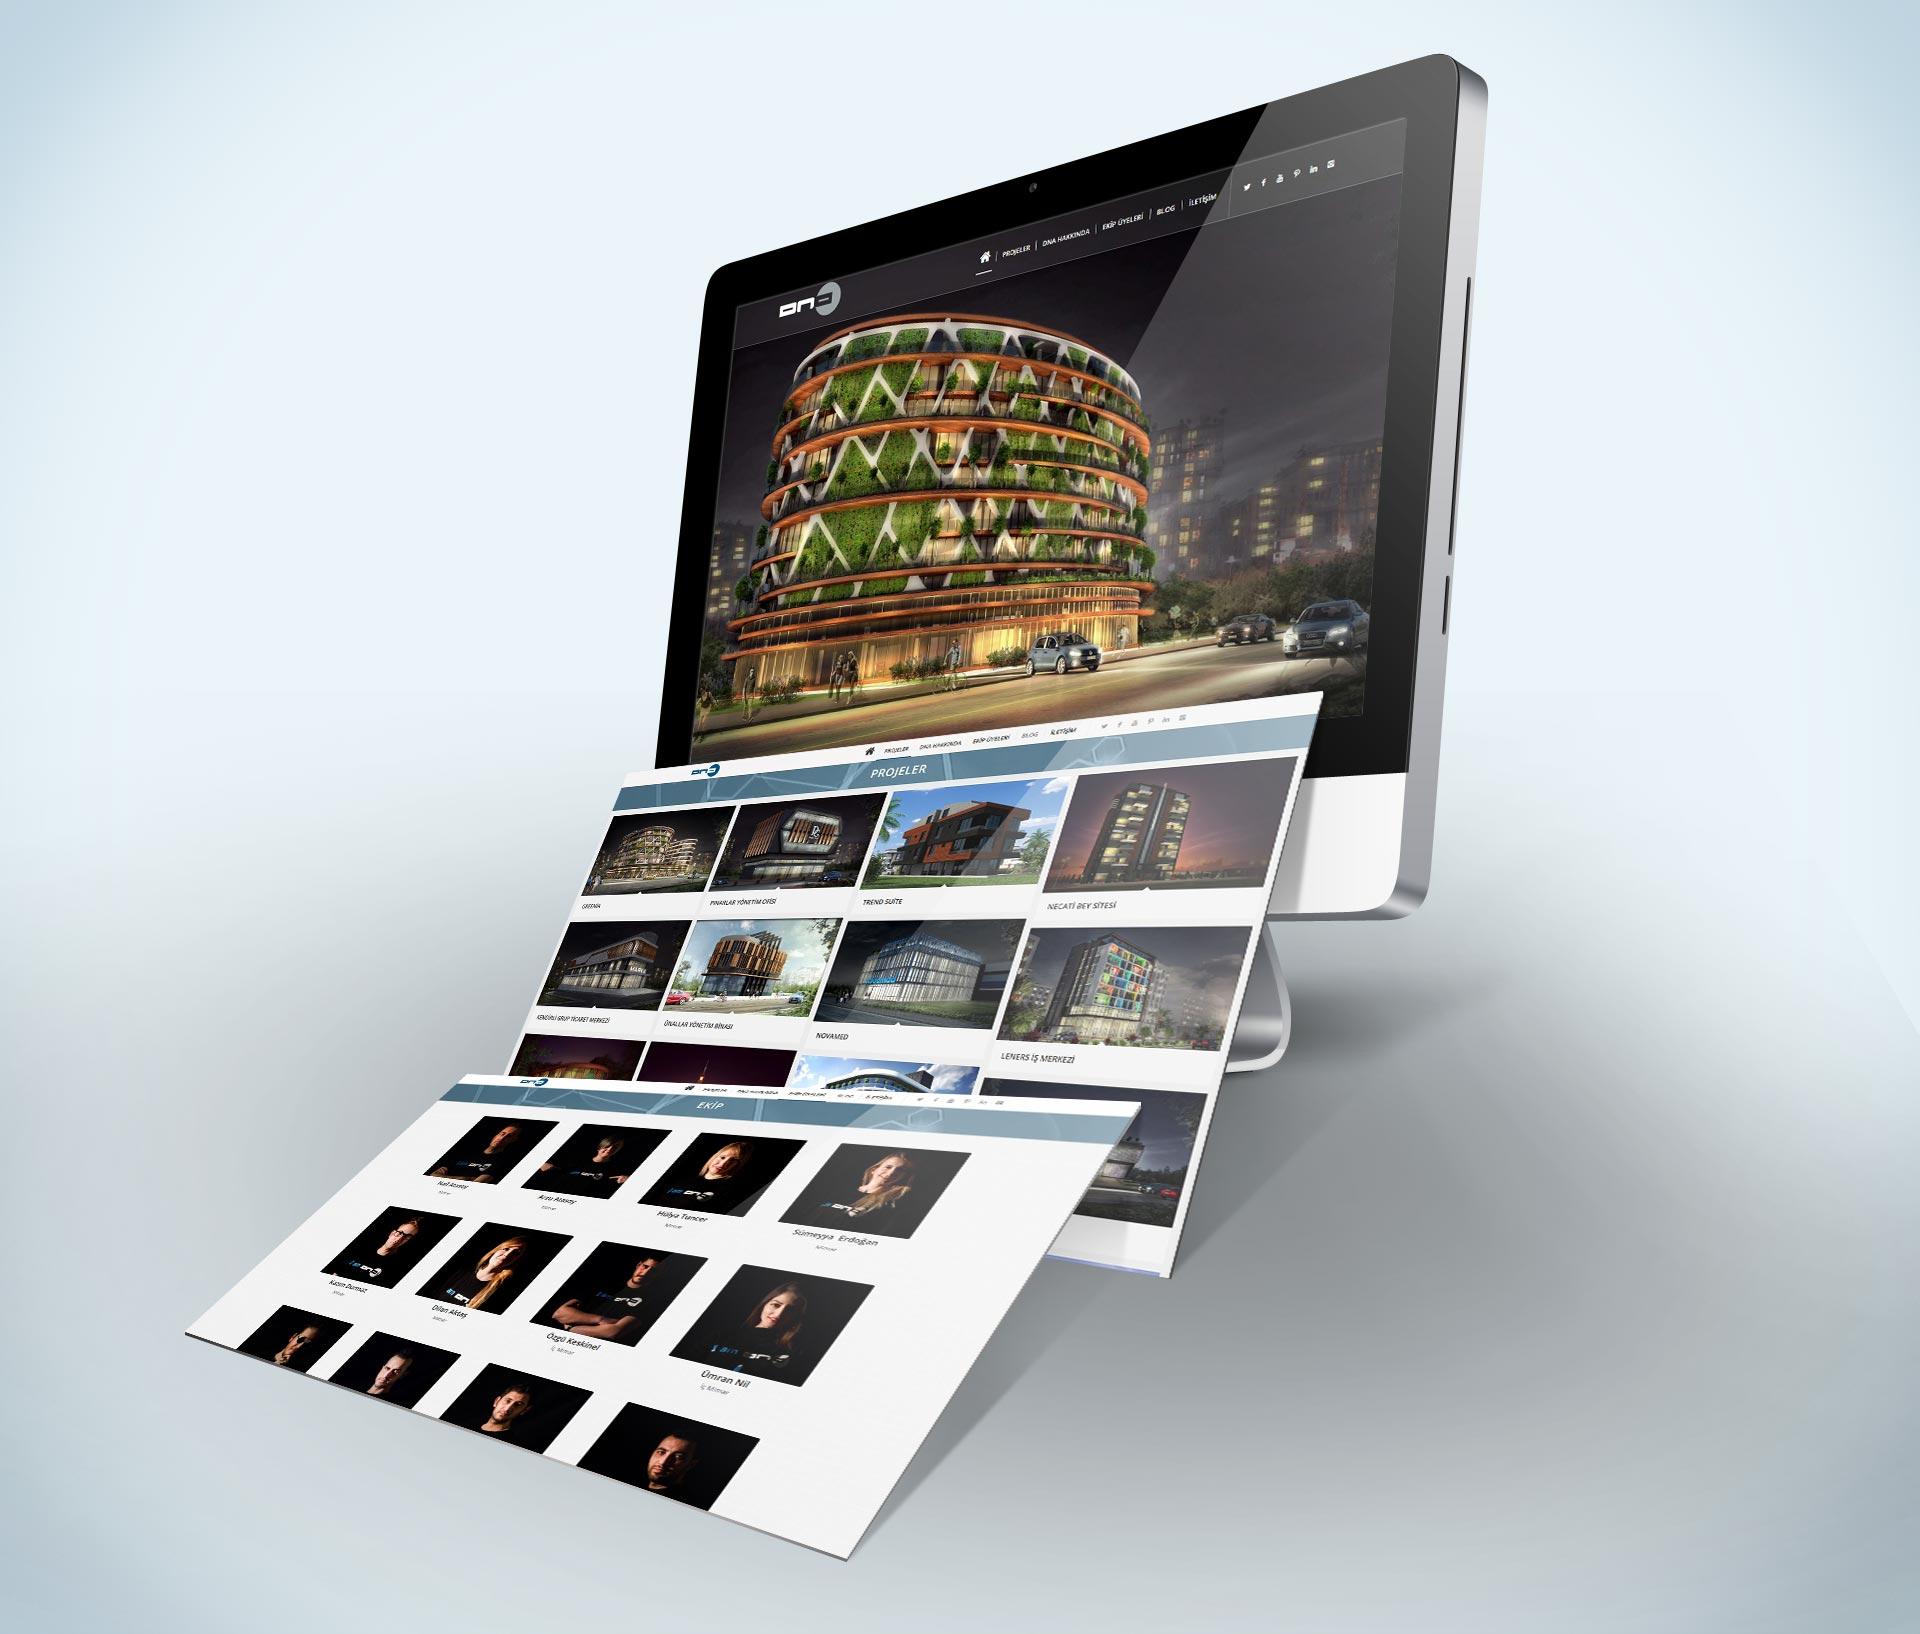 Mimar Web Siteleri | DNA Mimarlık - Mimar Nail Atasoy Antalya